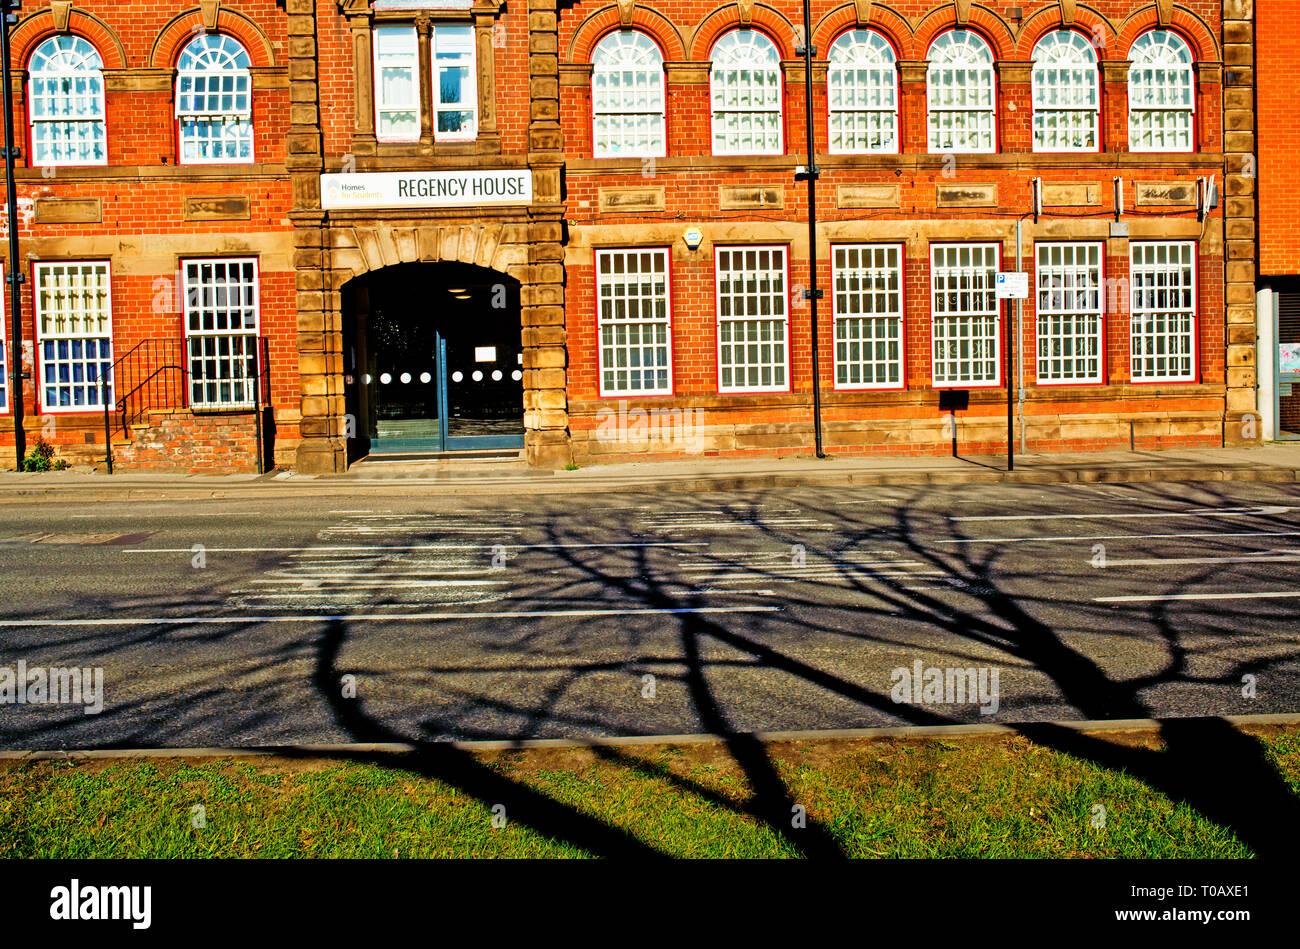 Sheffield, Regency House, student accomodation, St Marys Road,  England - Stock Image